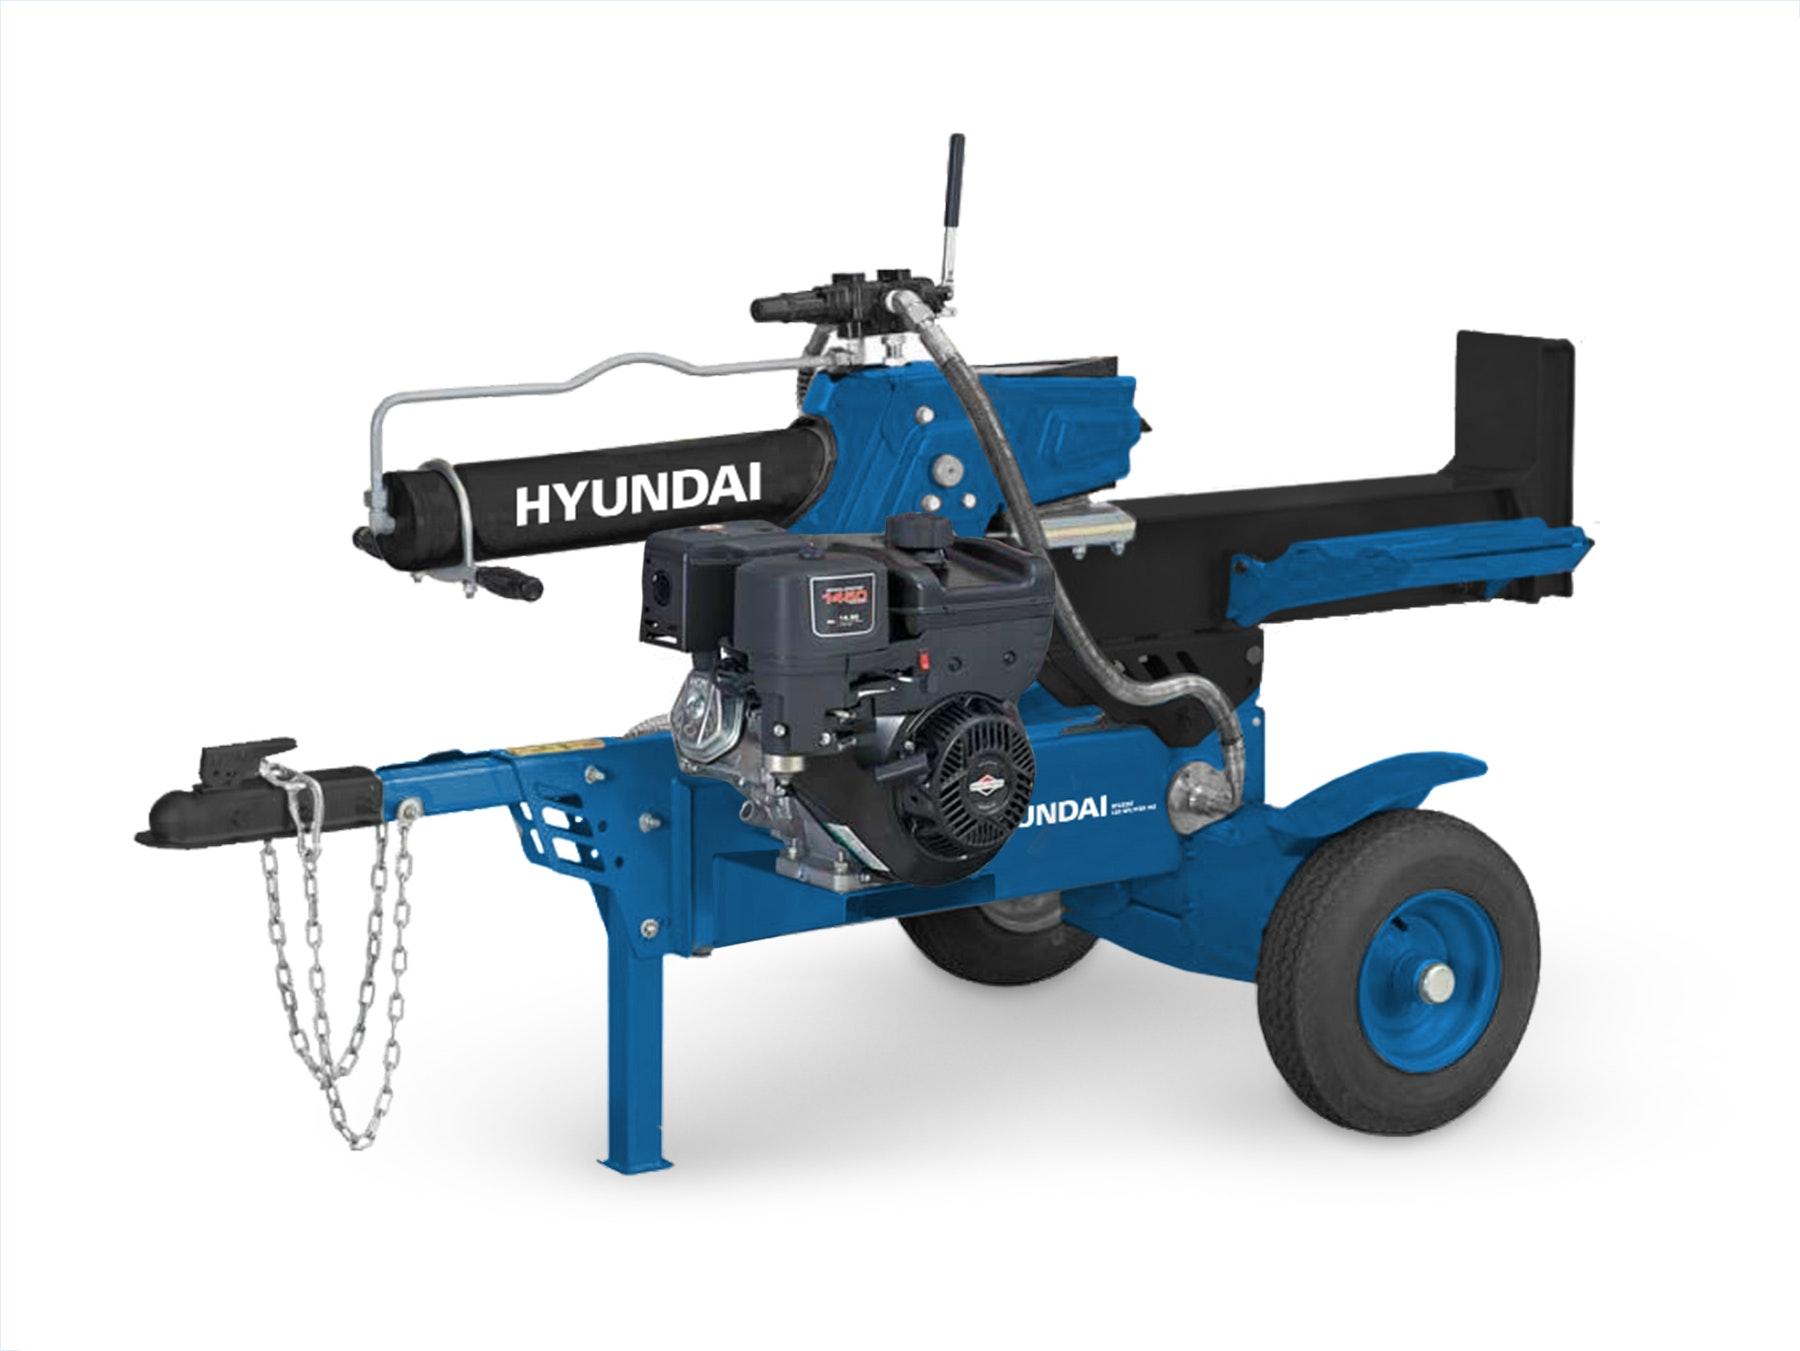 Hyundai Log Splitter 30T